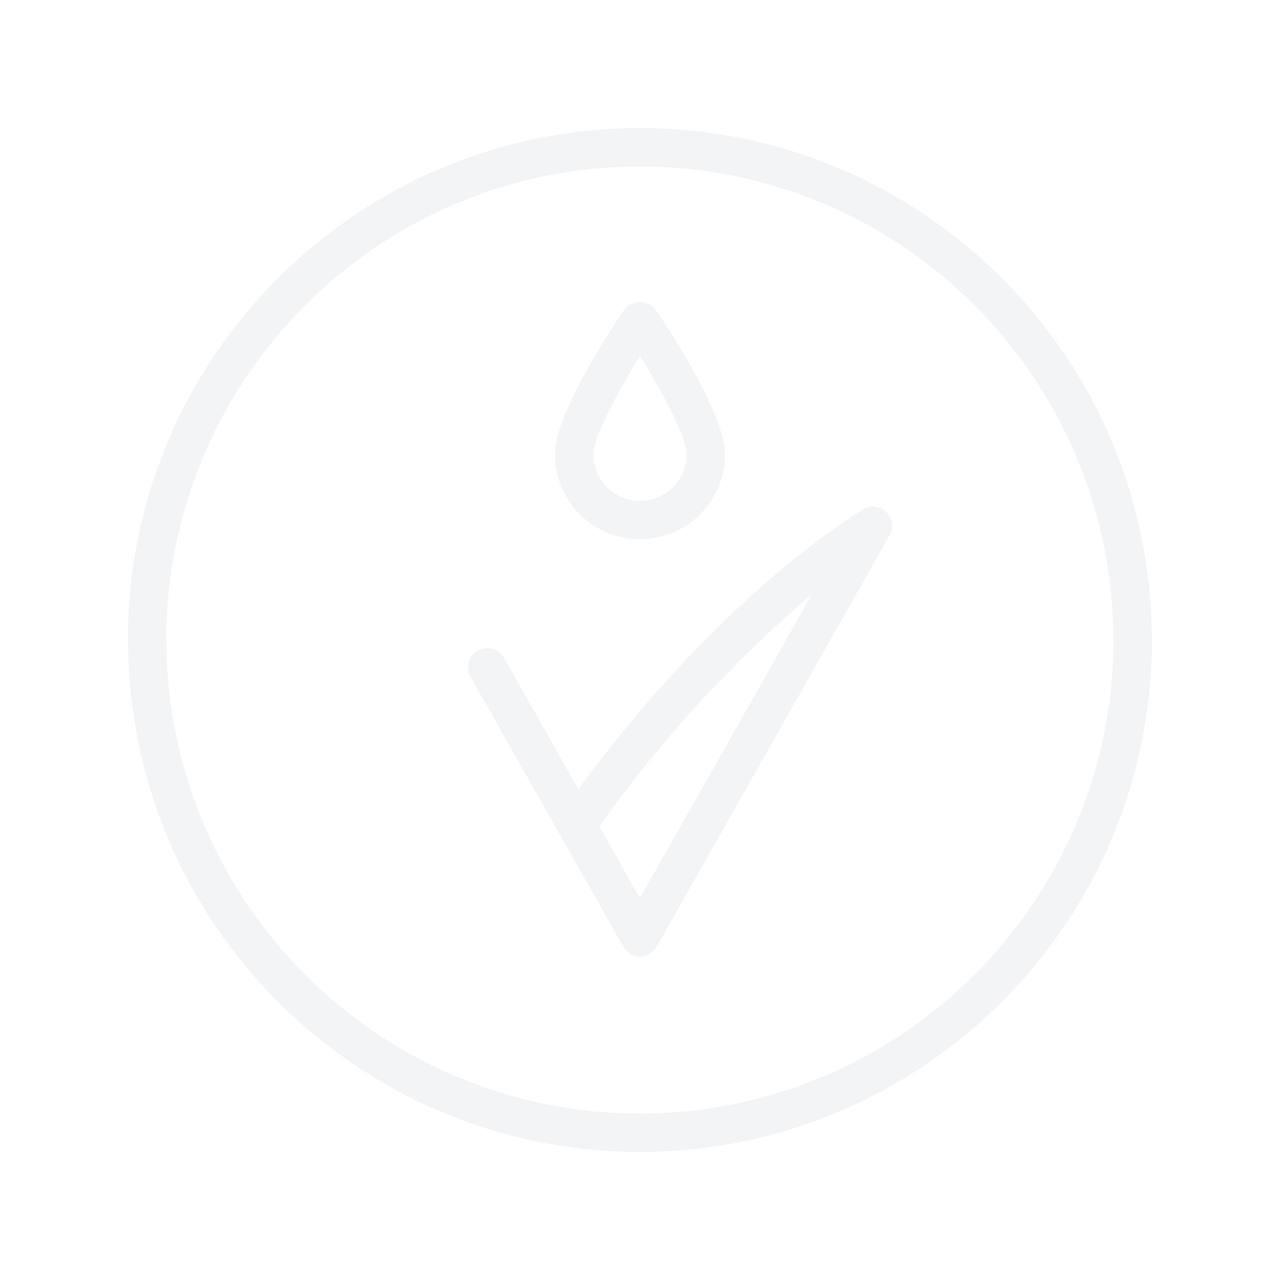 BAREMINERALS Lash Domination Ink Eyeliner Intense Black 0.6ml